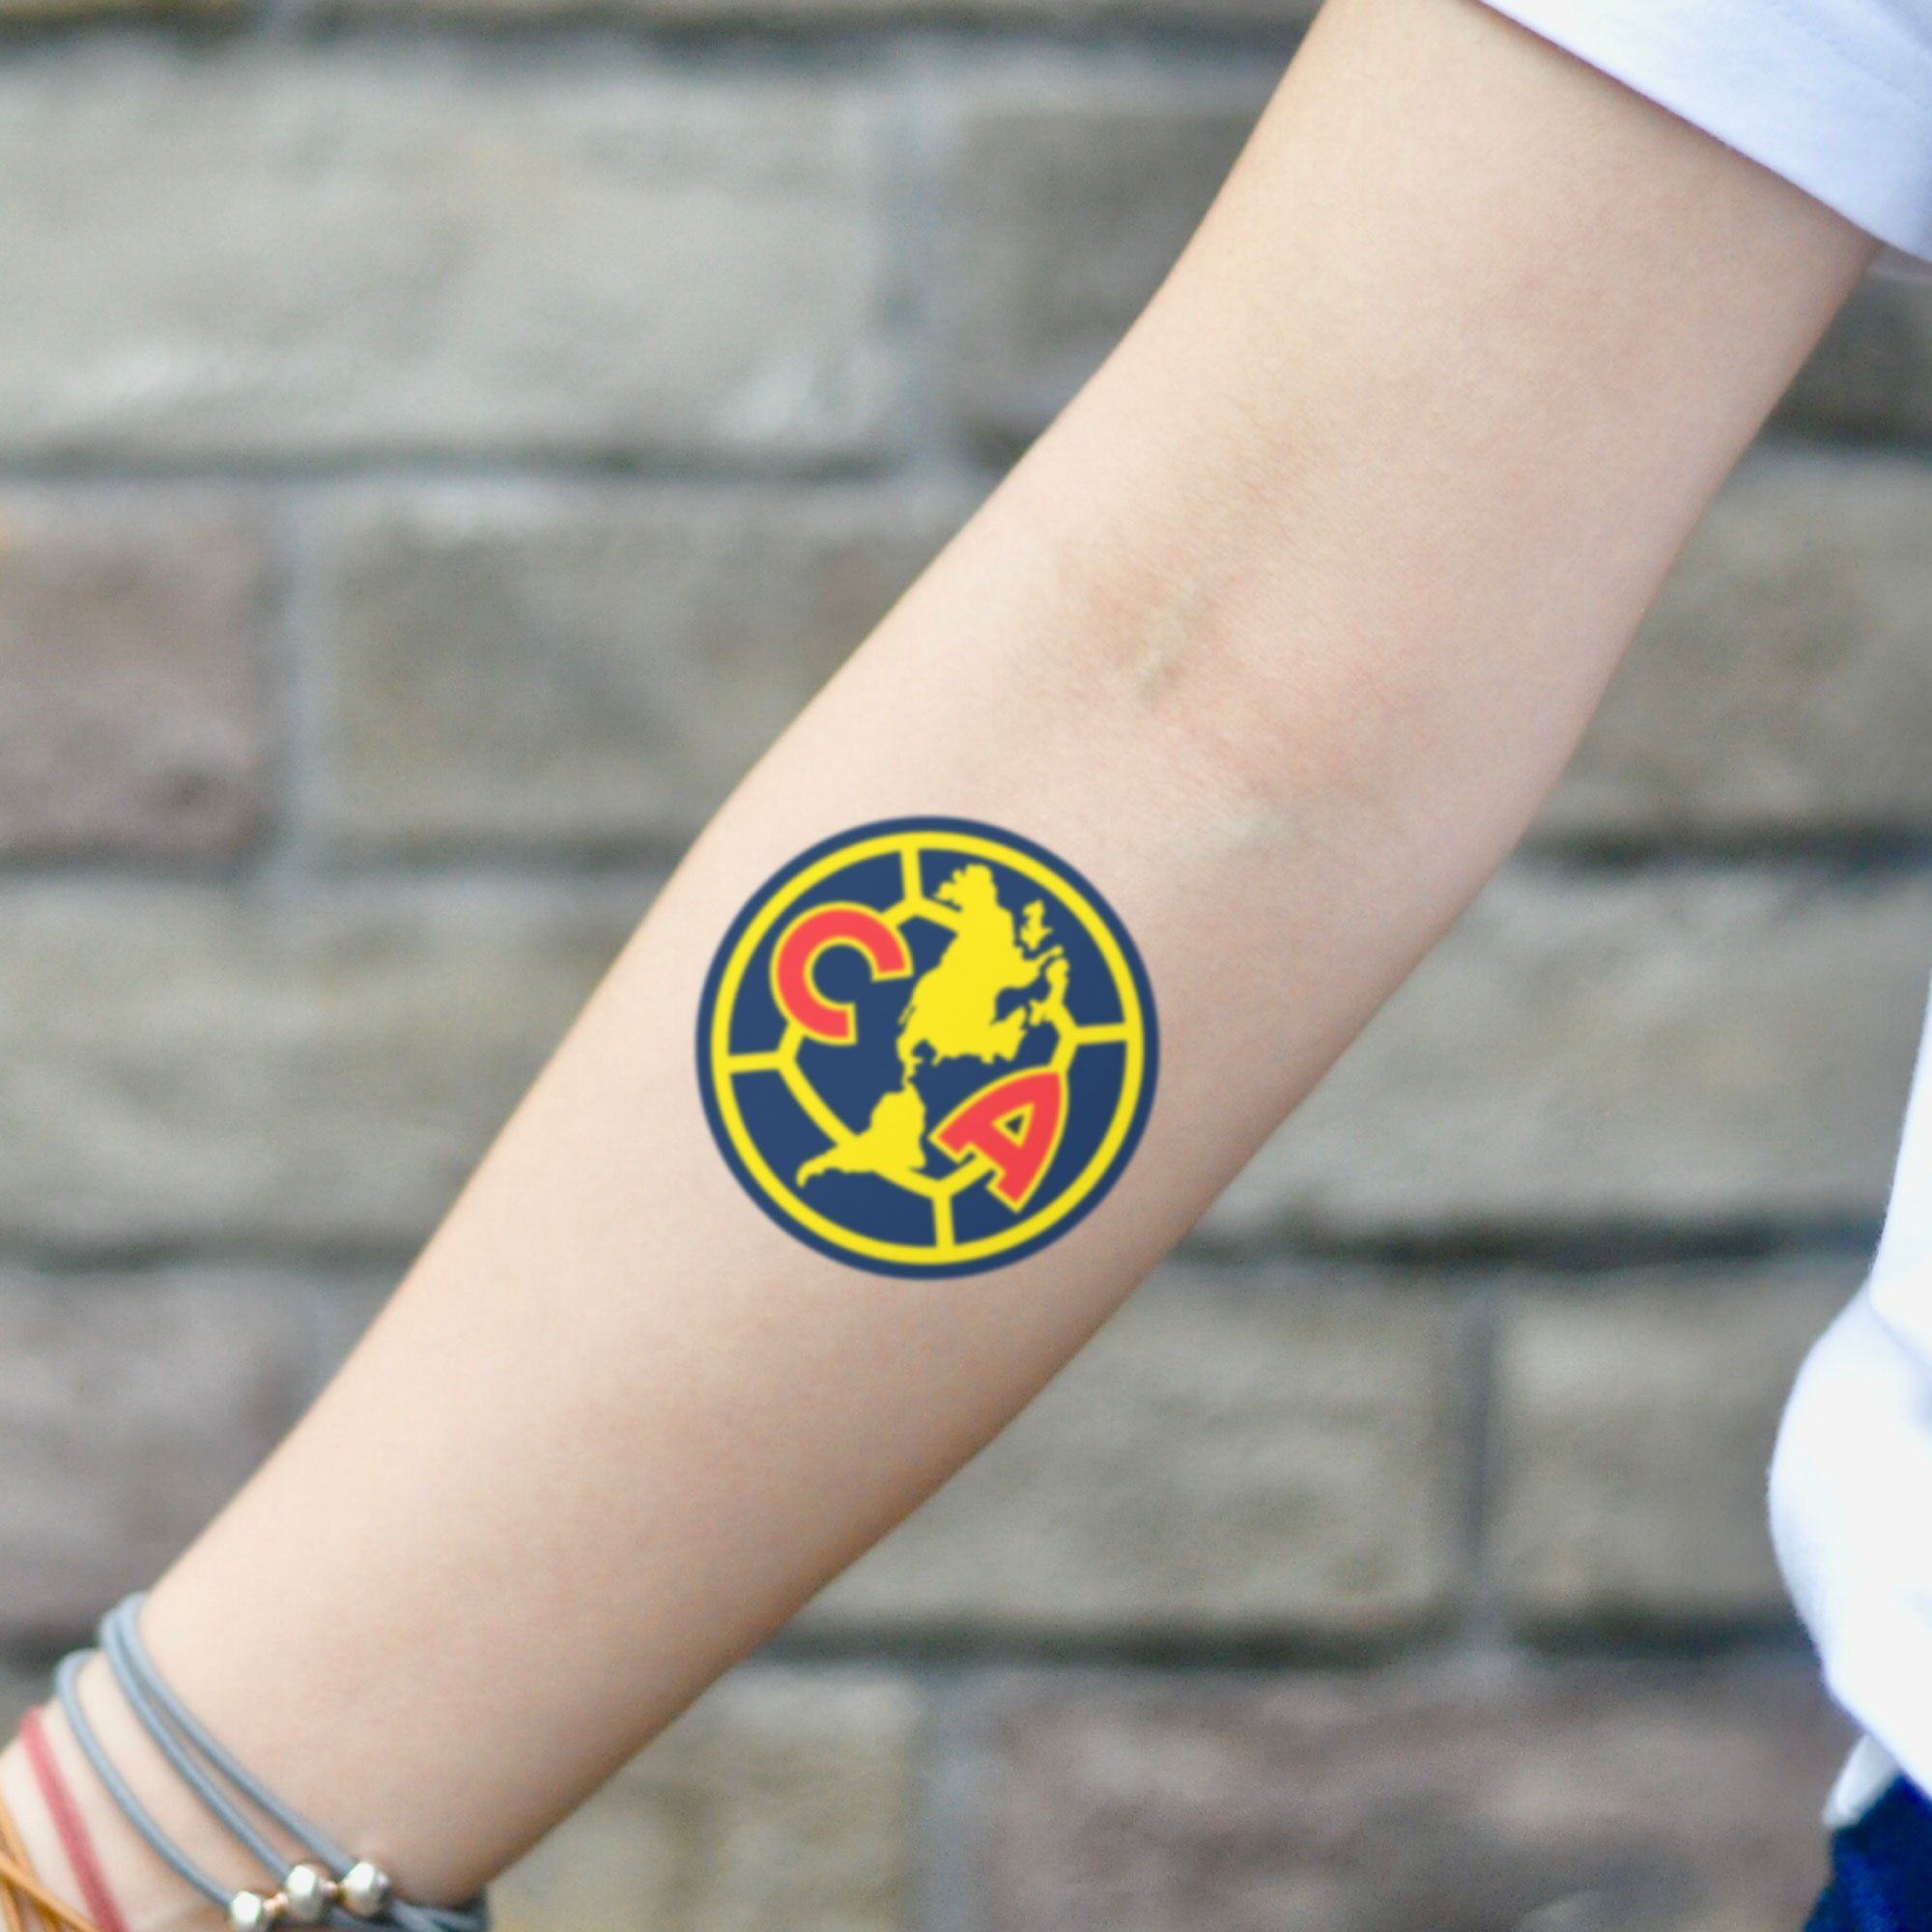 Club America Temporary Tattoo Sticker (Set of 2) in 2020